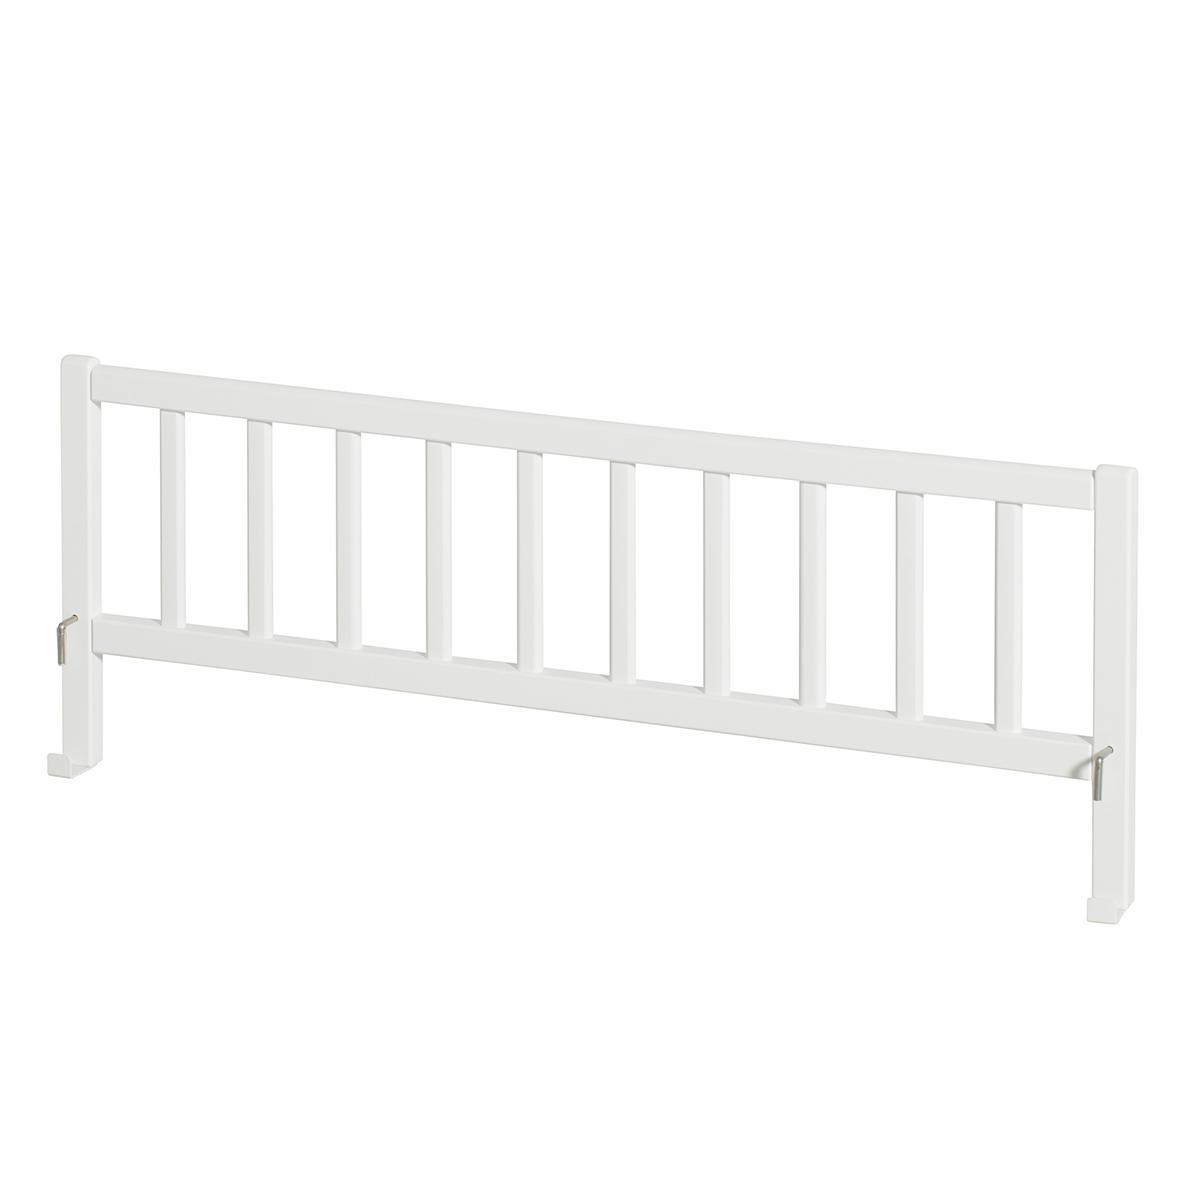 Barrera seguridad SEASIDE Oliver Furniture blanco